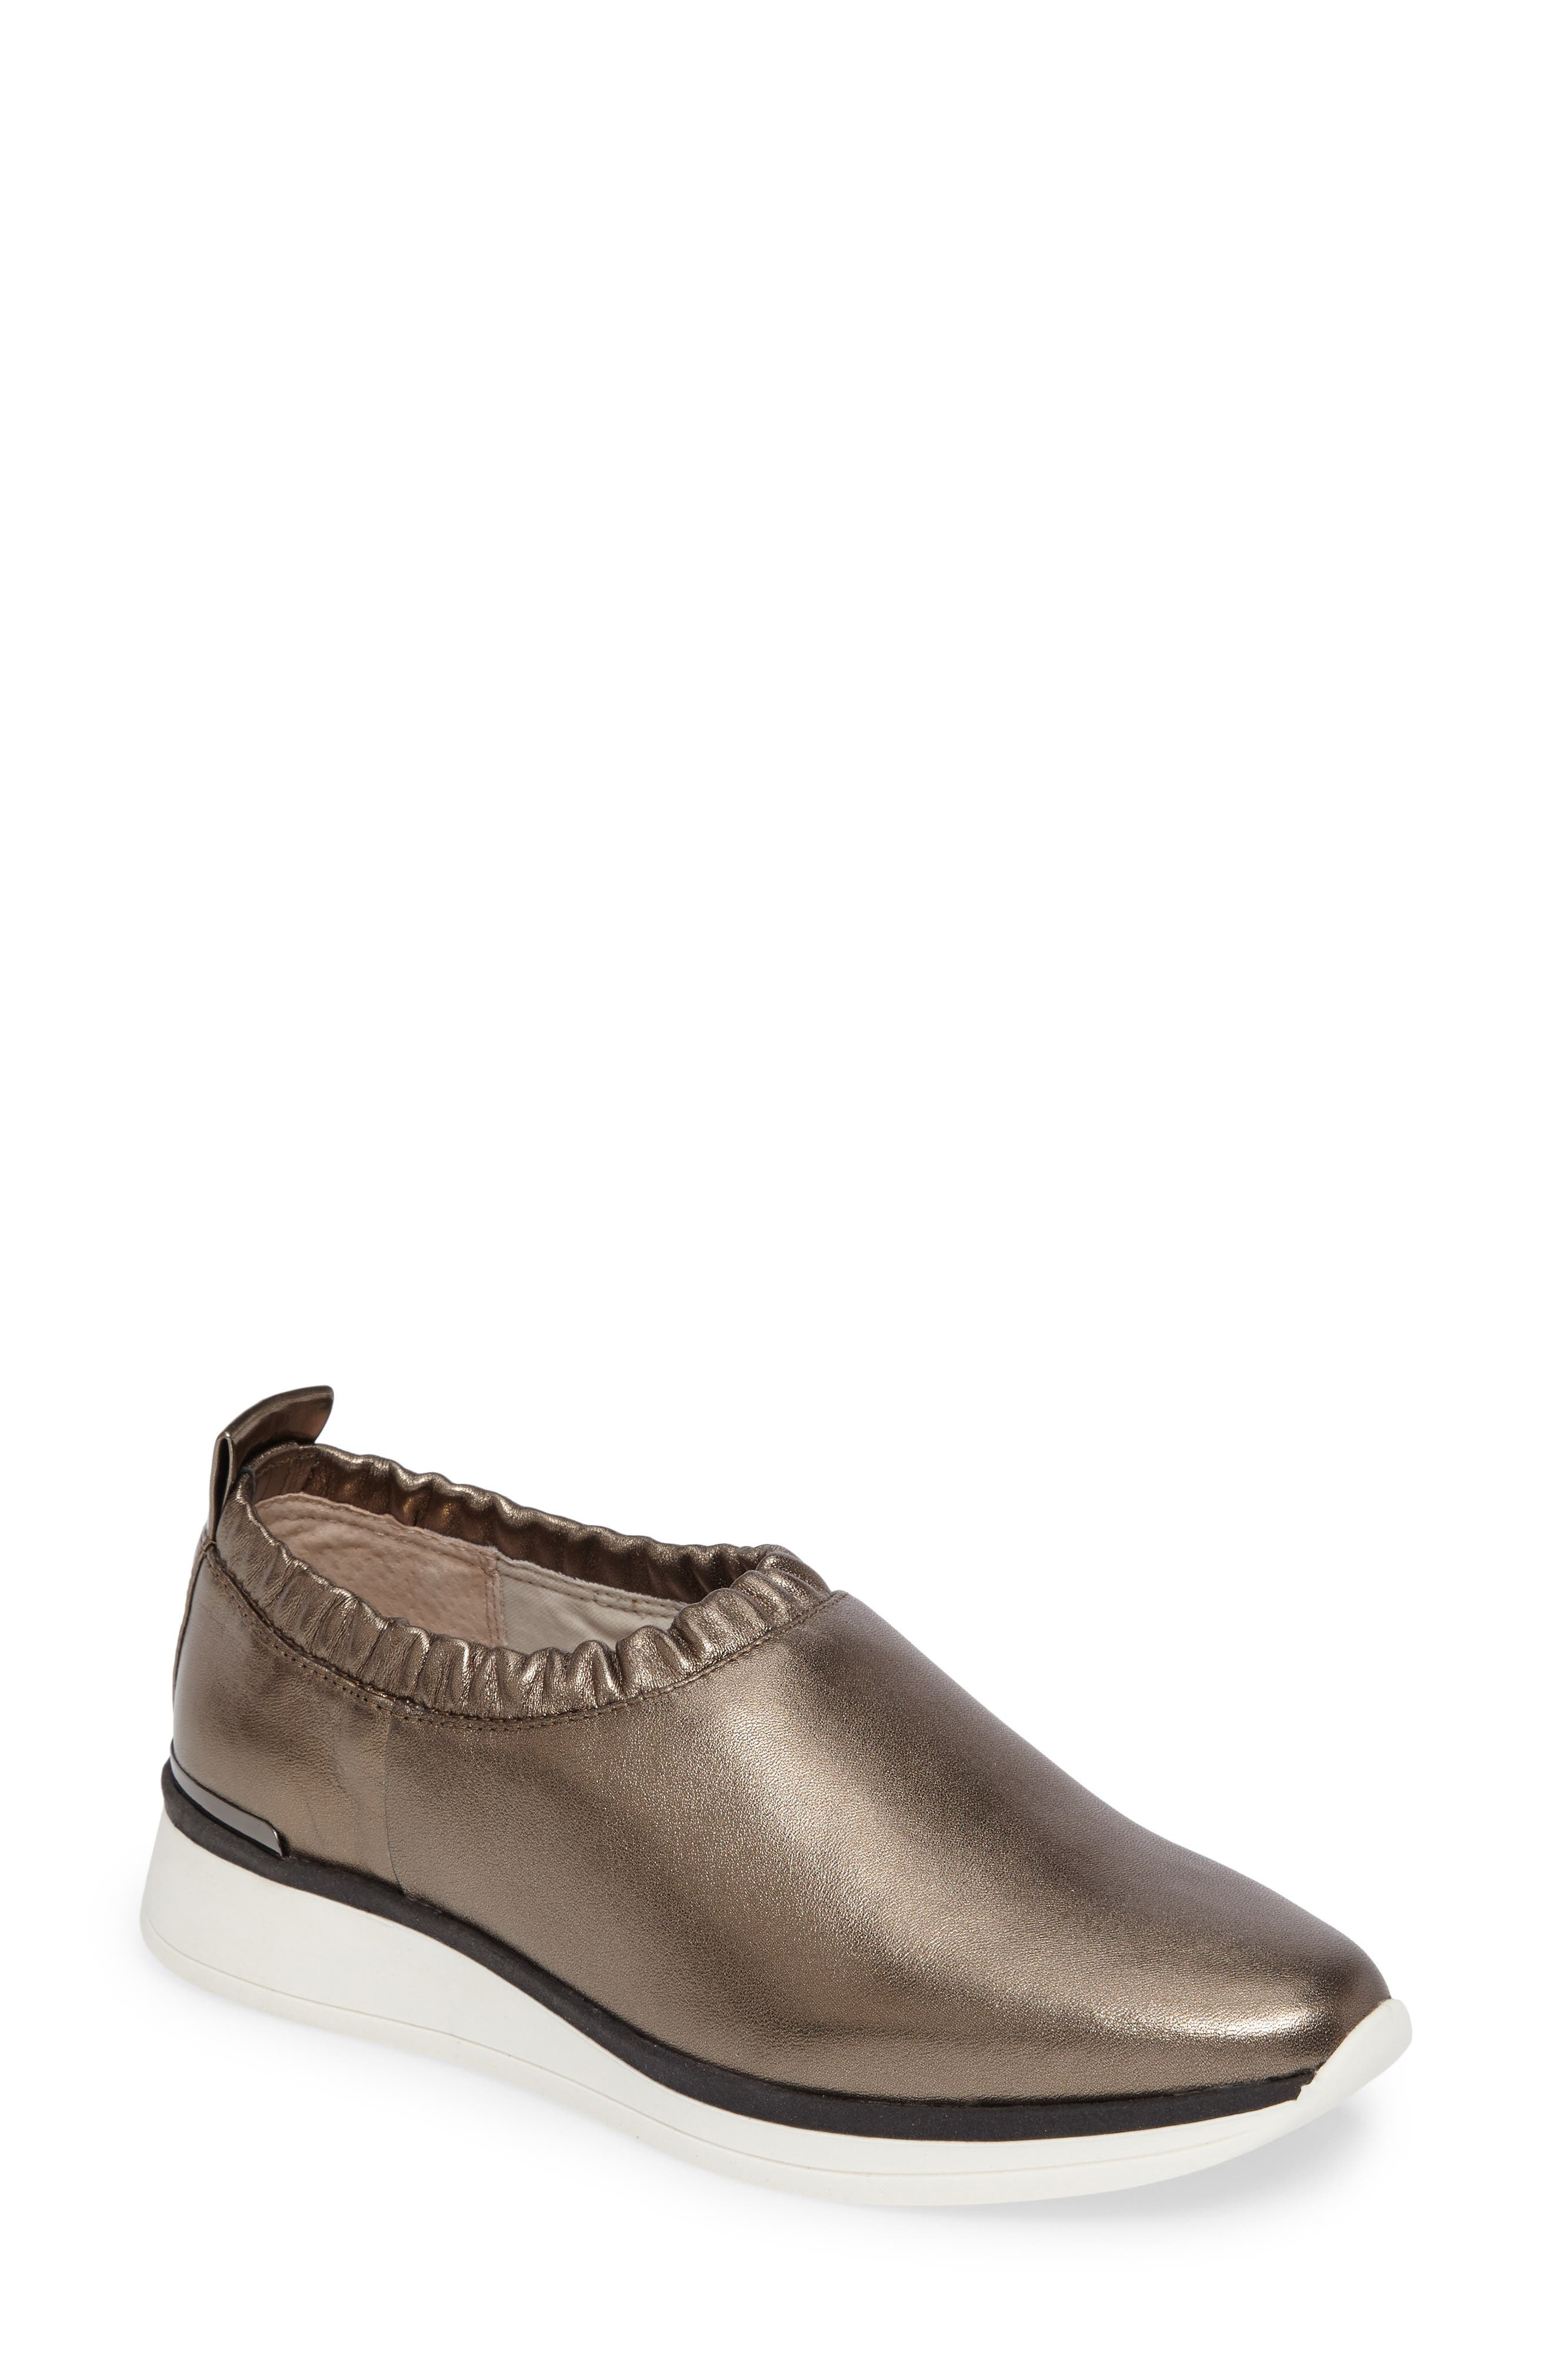 Main Image - Louise et Cie Brogen Slip-On Sneaker (Women)